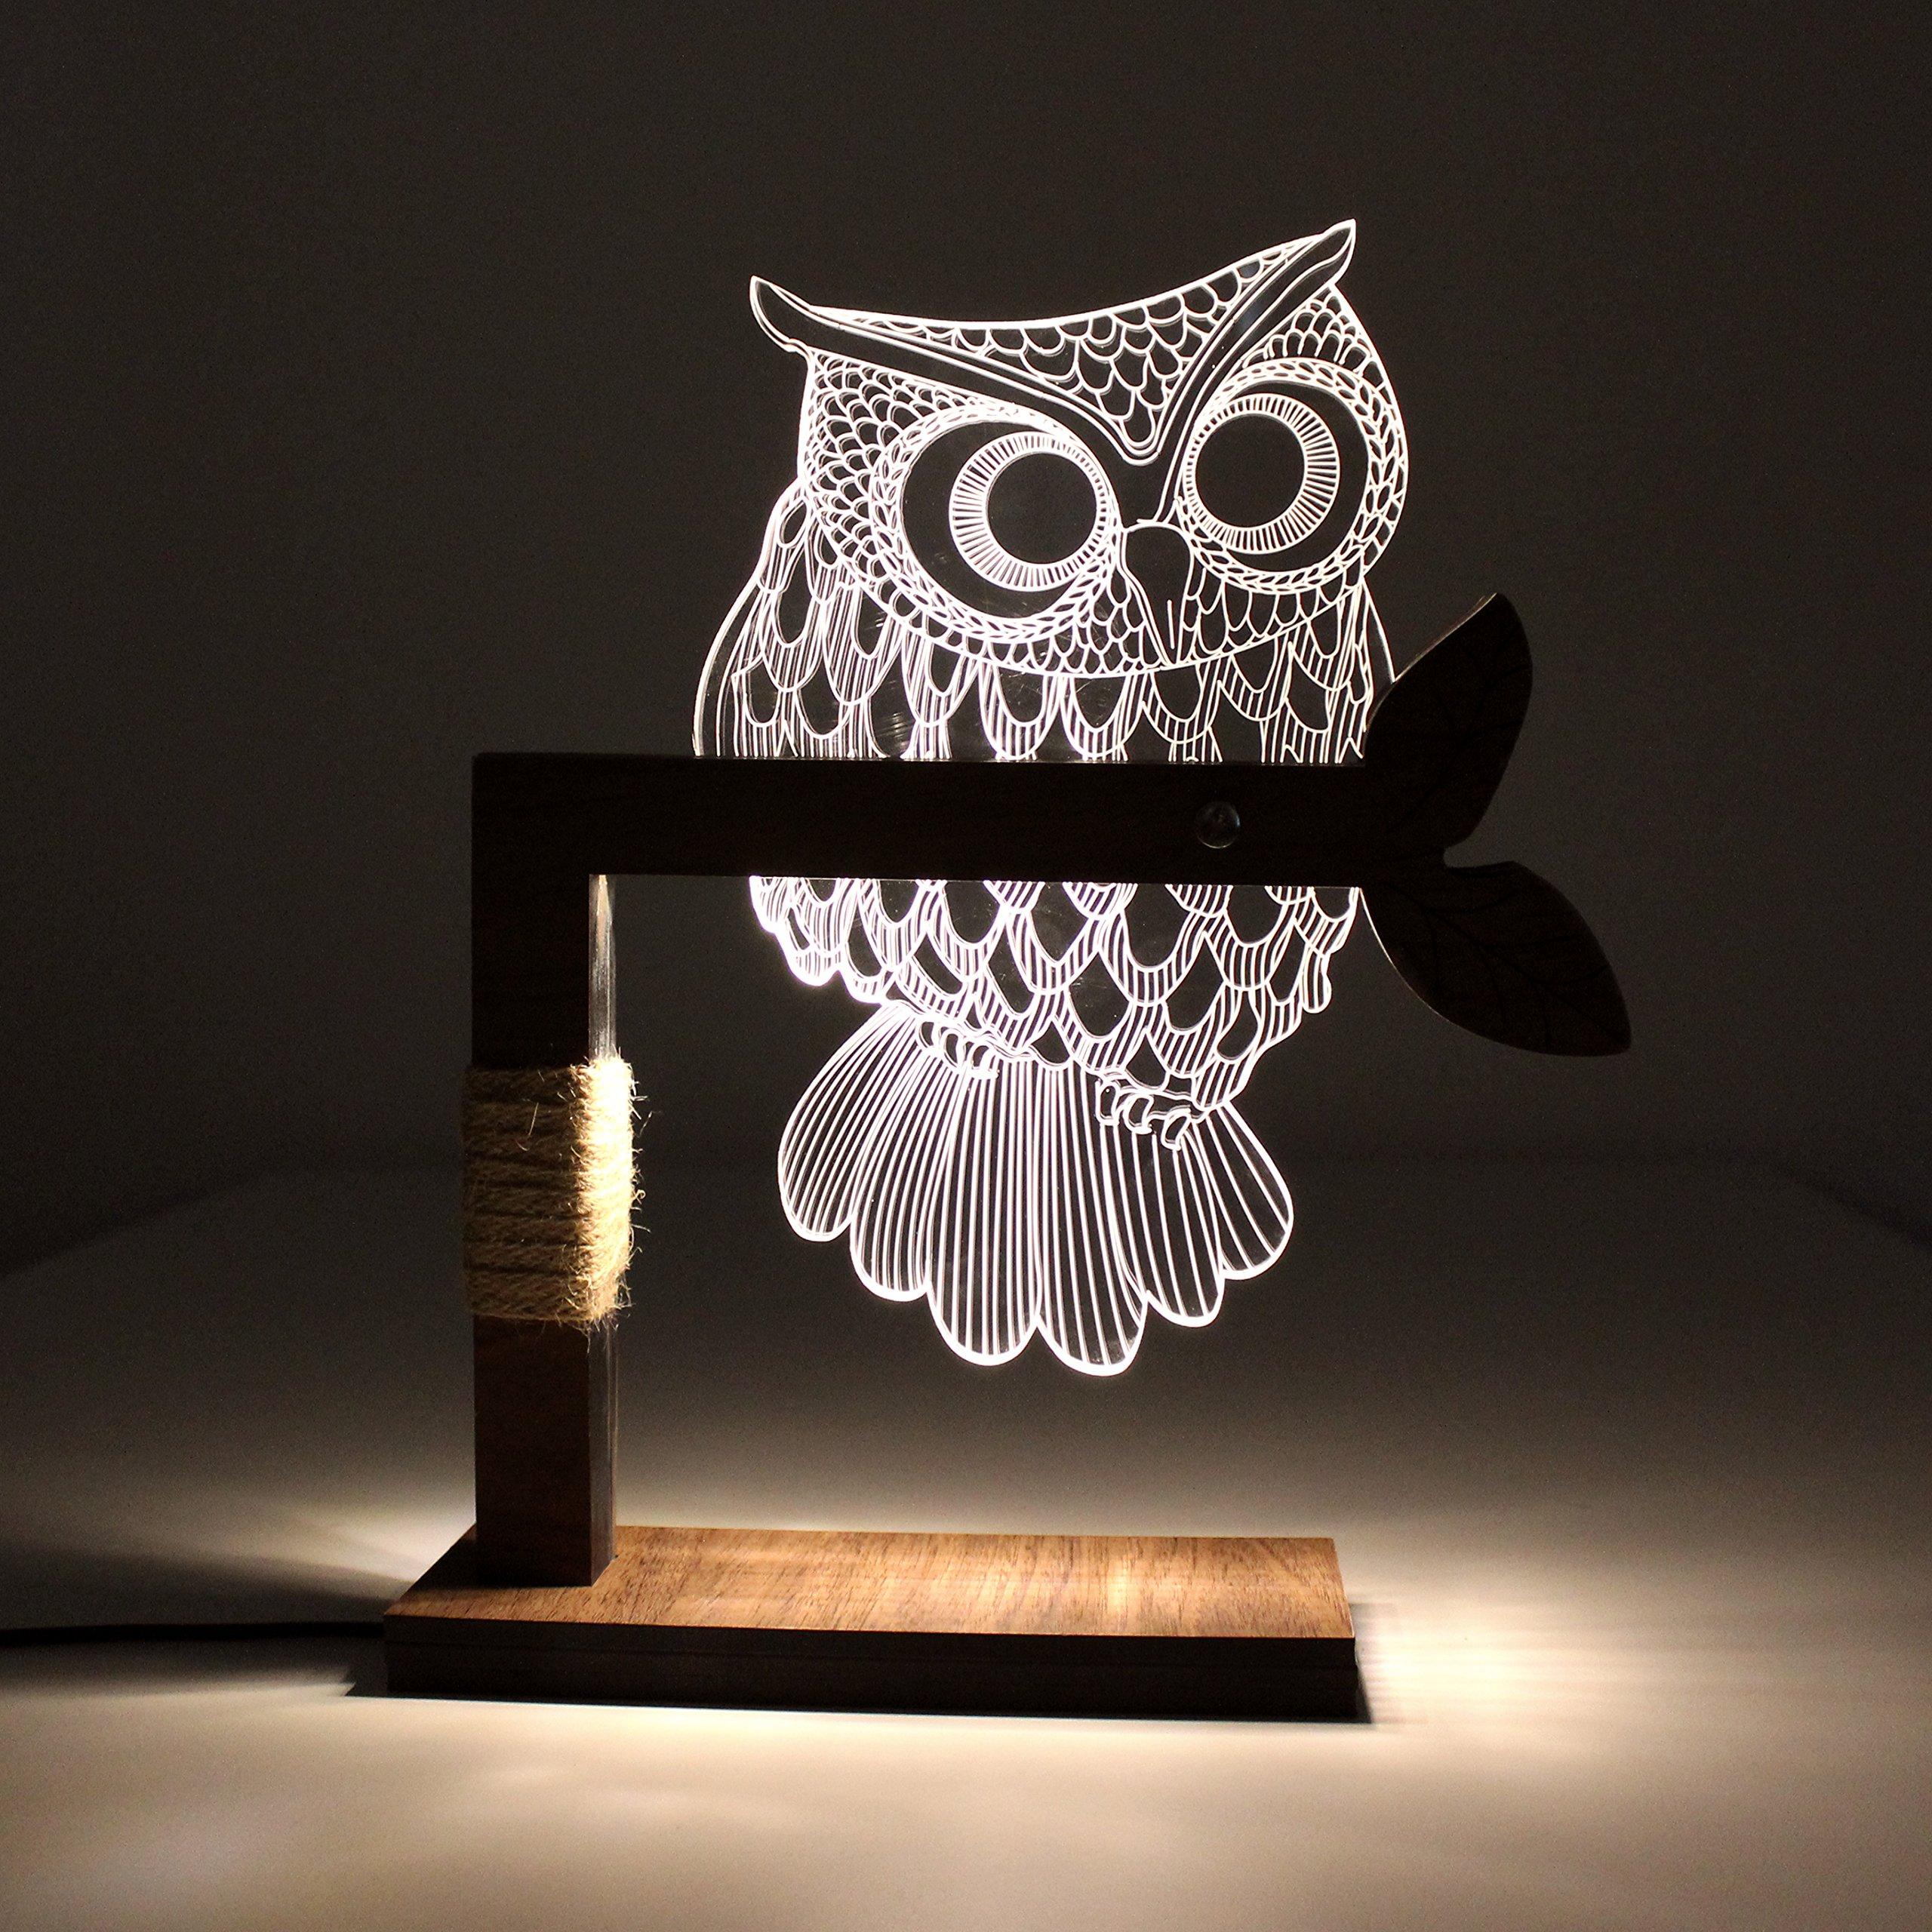 CozyWow Home 3D Owl Shape LED Desk Table Lamp Night Light US Plug ( Warm White)